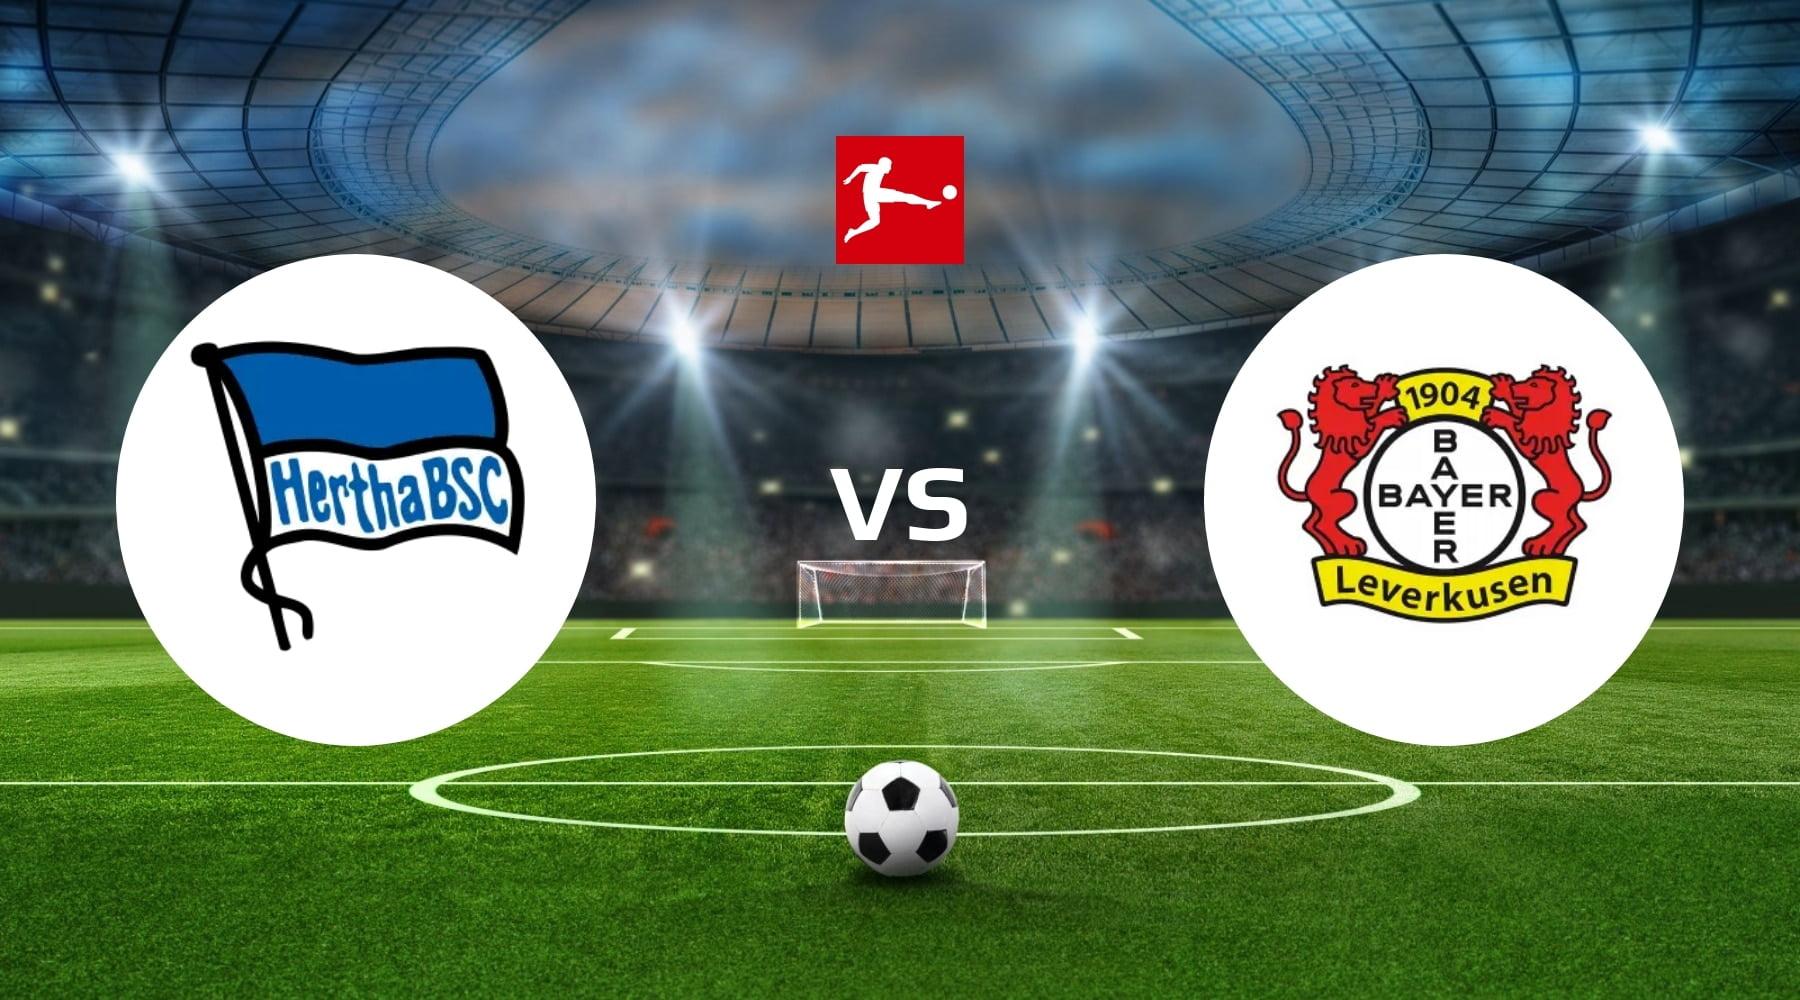 Hertha Berlin vs Bayer 04 Leverkusen Betting